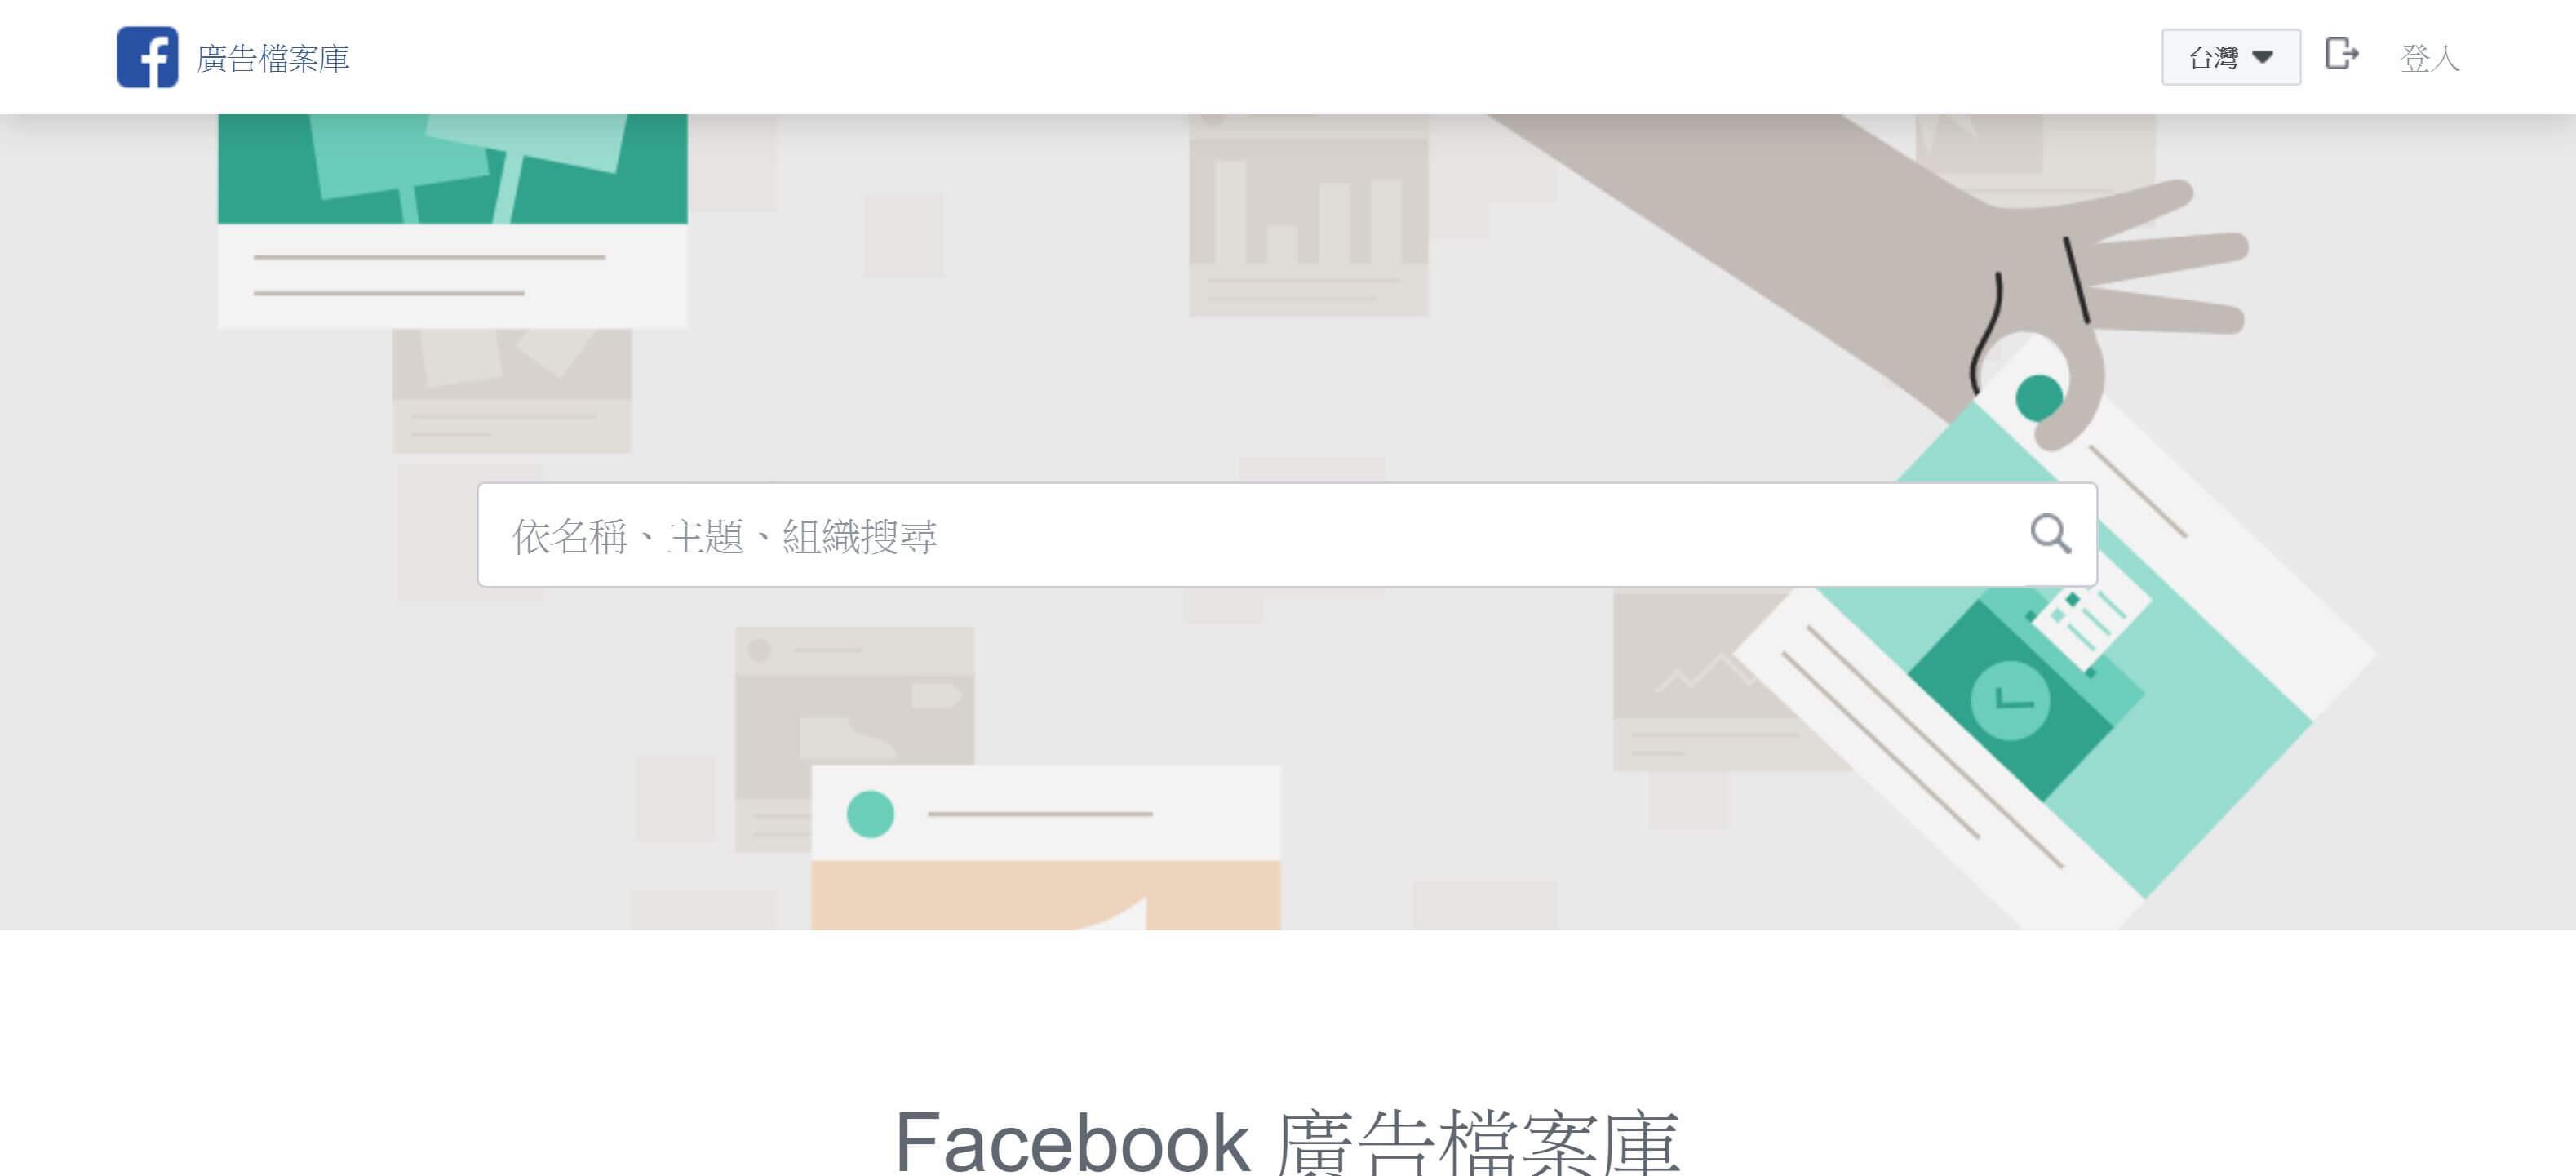 Facebook廣告檔案庫首頁